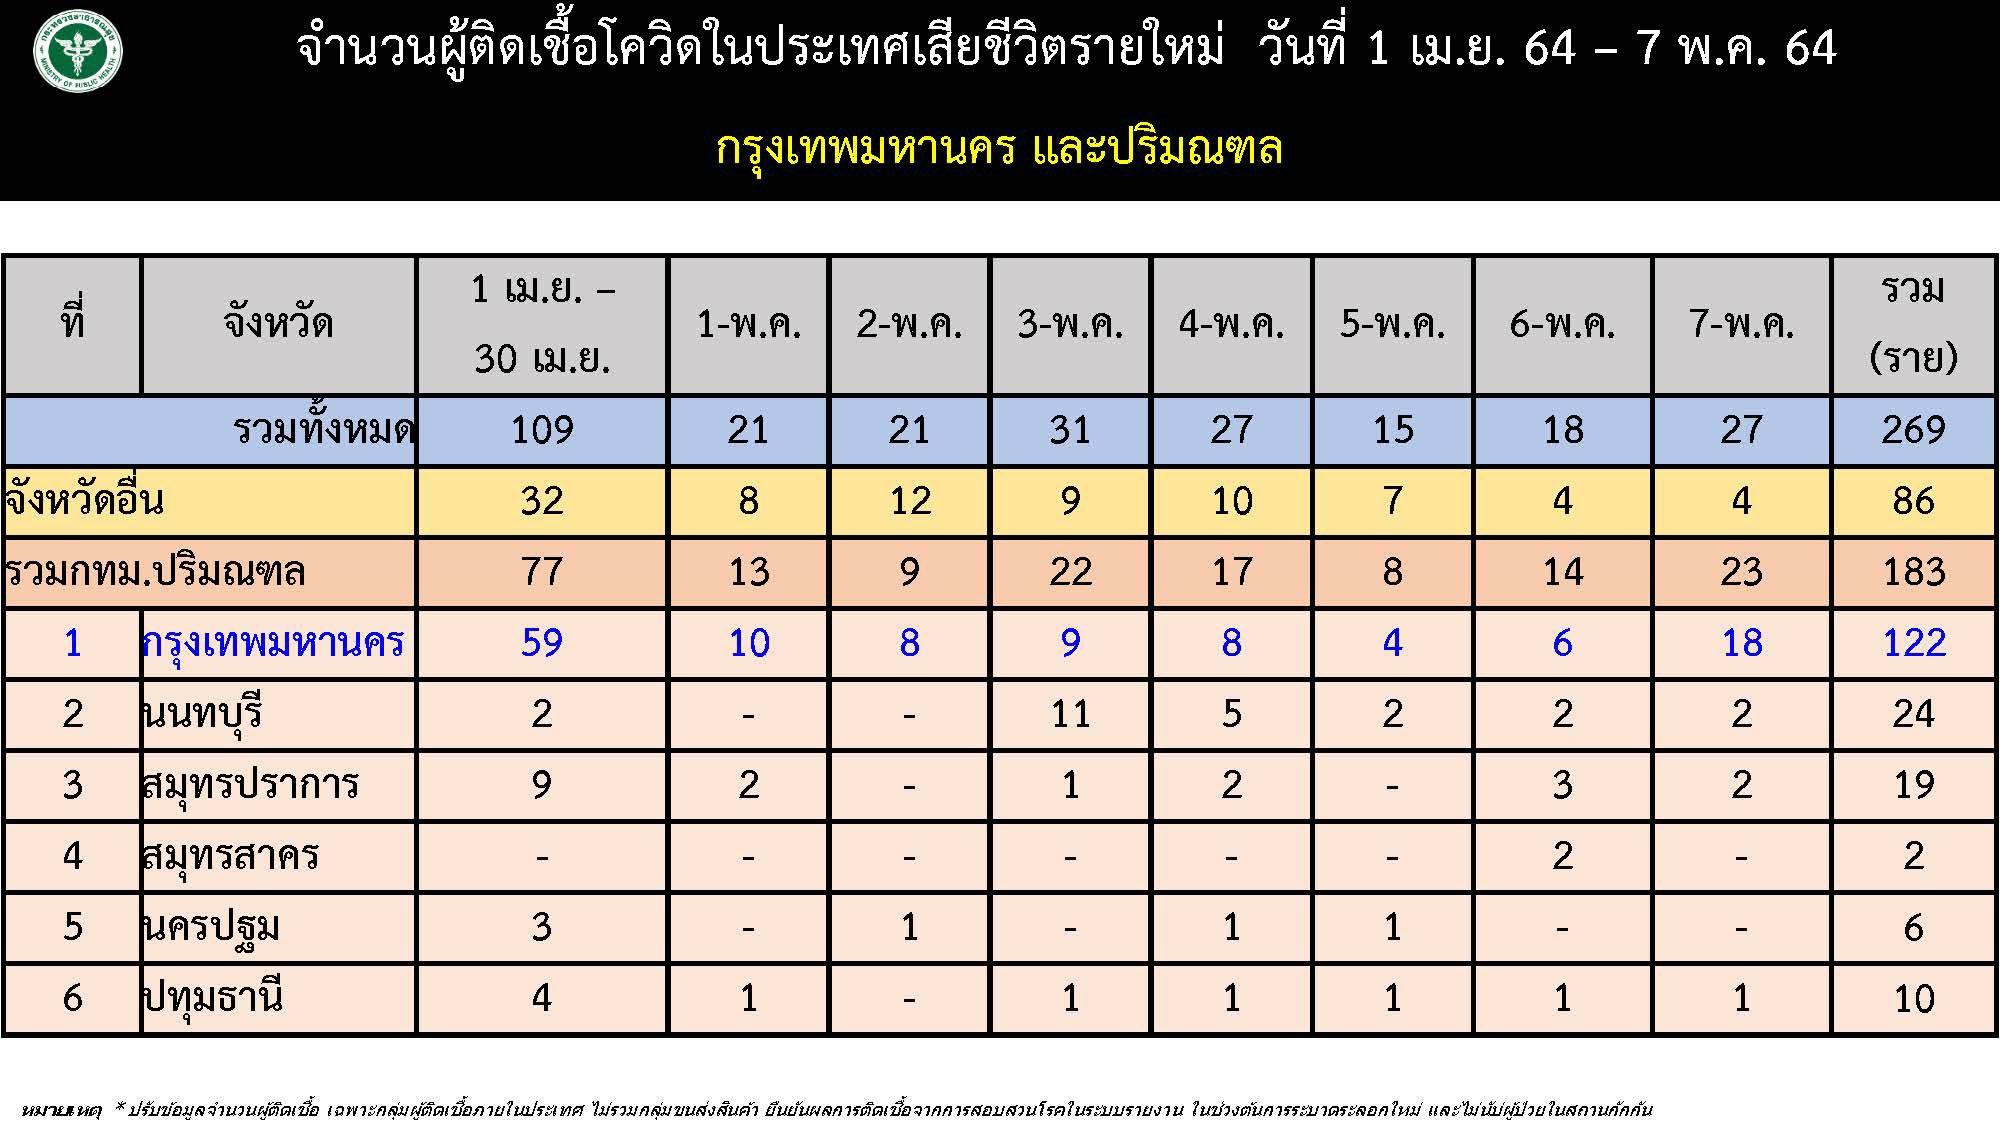 www.thaiguide.dk/images/forum/covid19/dodsfald%20provinse%2006-05-21.jpeg